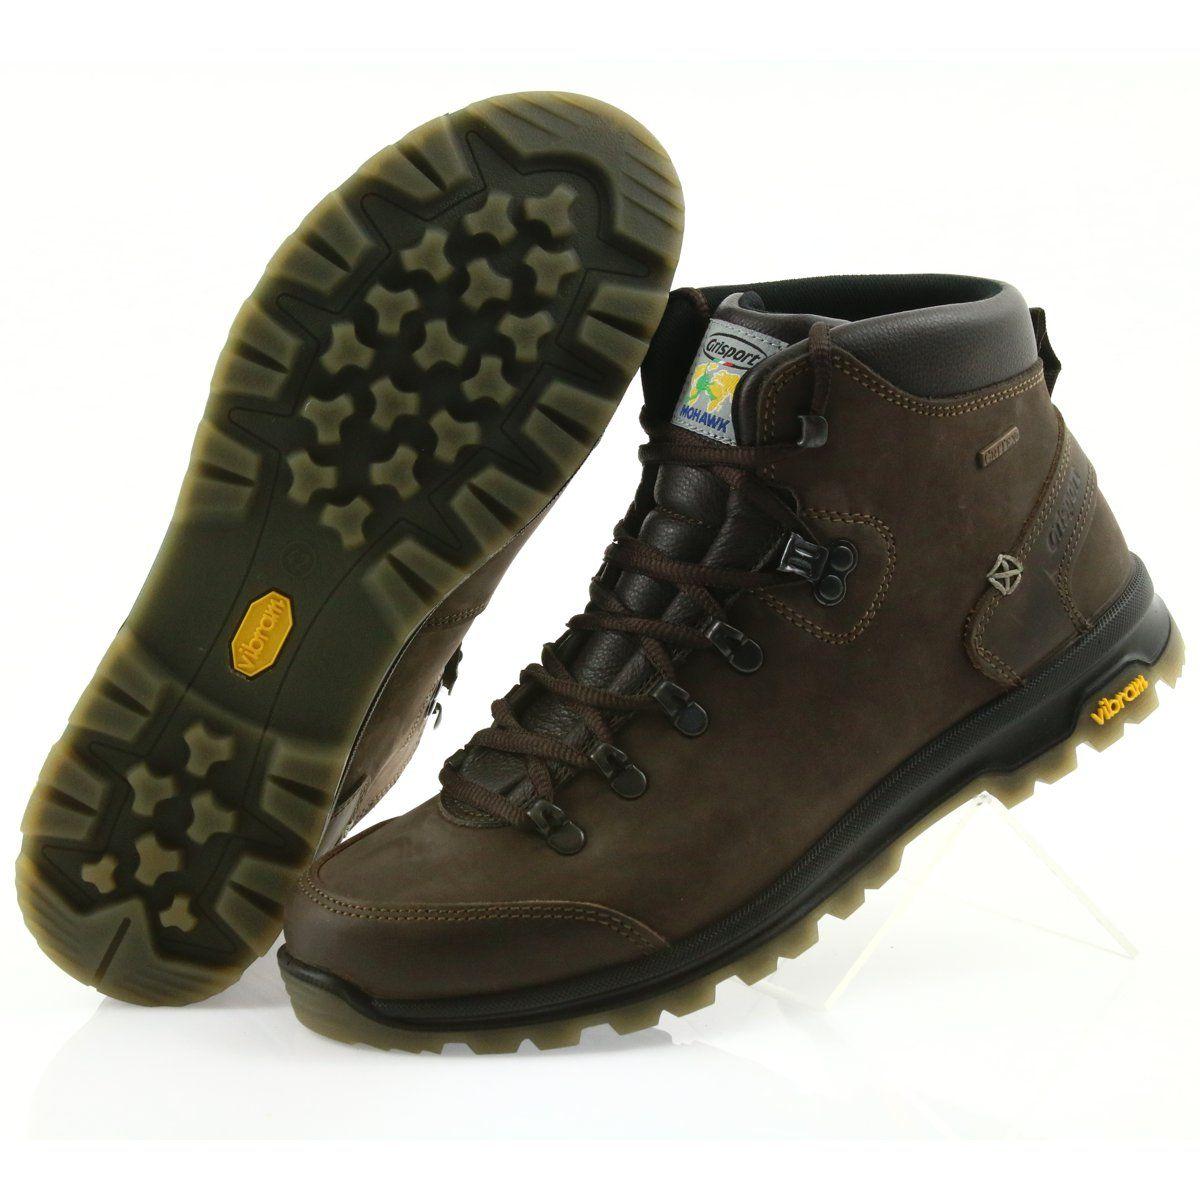 Grisport Brazowe Buty Trekkingowe Trekking Shoes Shoes Hiking Boots